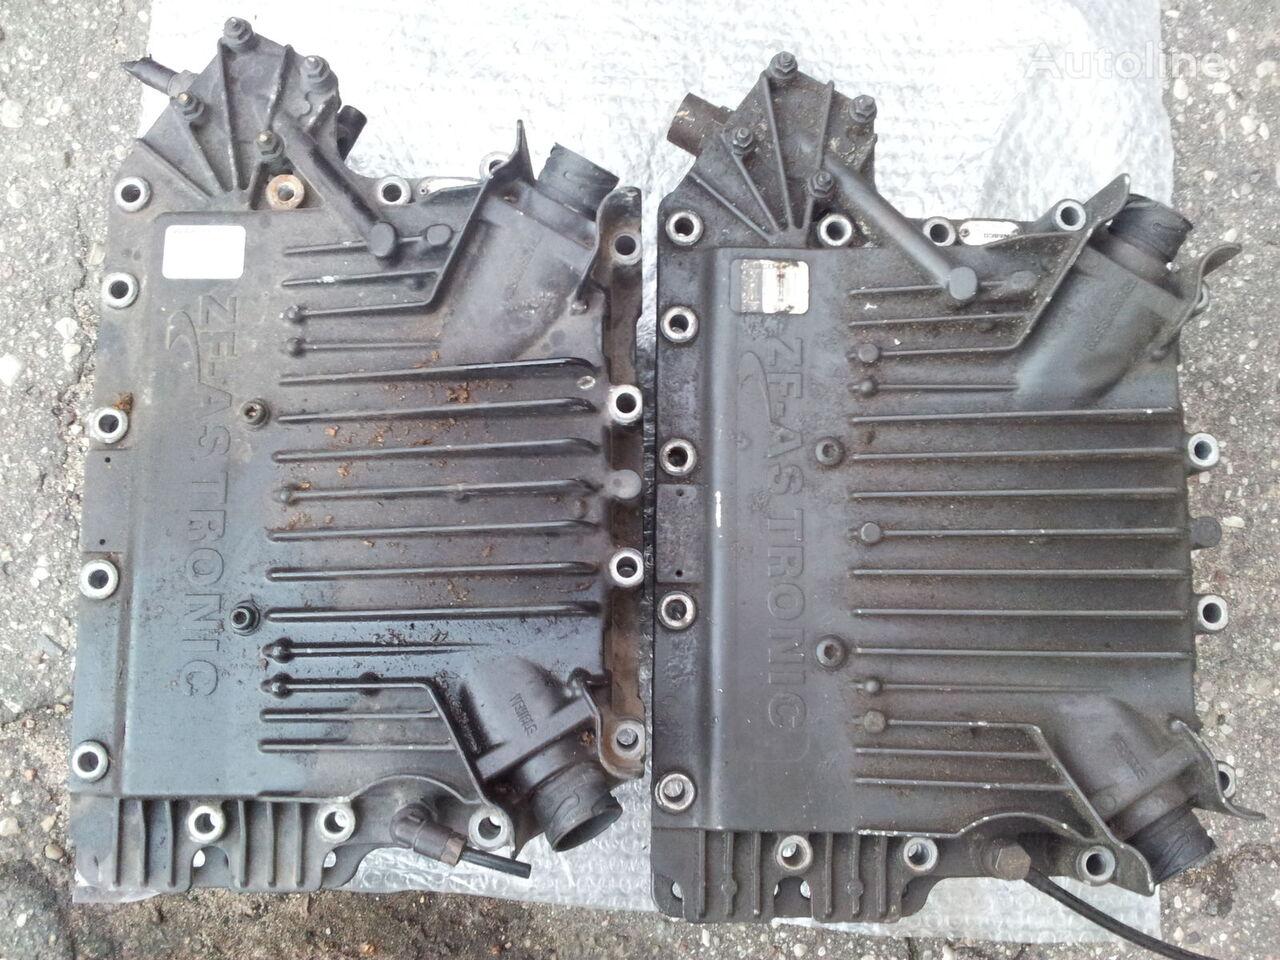 Man Automatic Gearbox Control Zf Astronic Ecu Ge 4213550120 Wiring Diagram Photo Unit For Tga Tgx Tgl Tgs Tractor